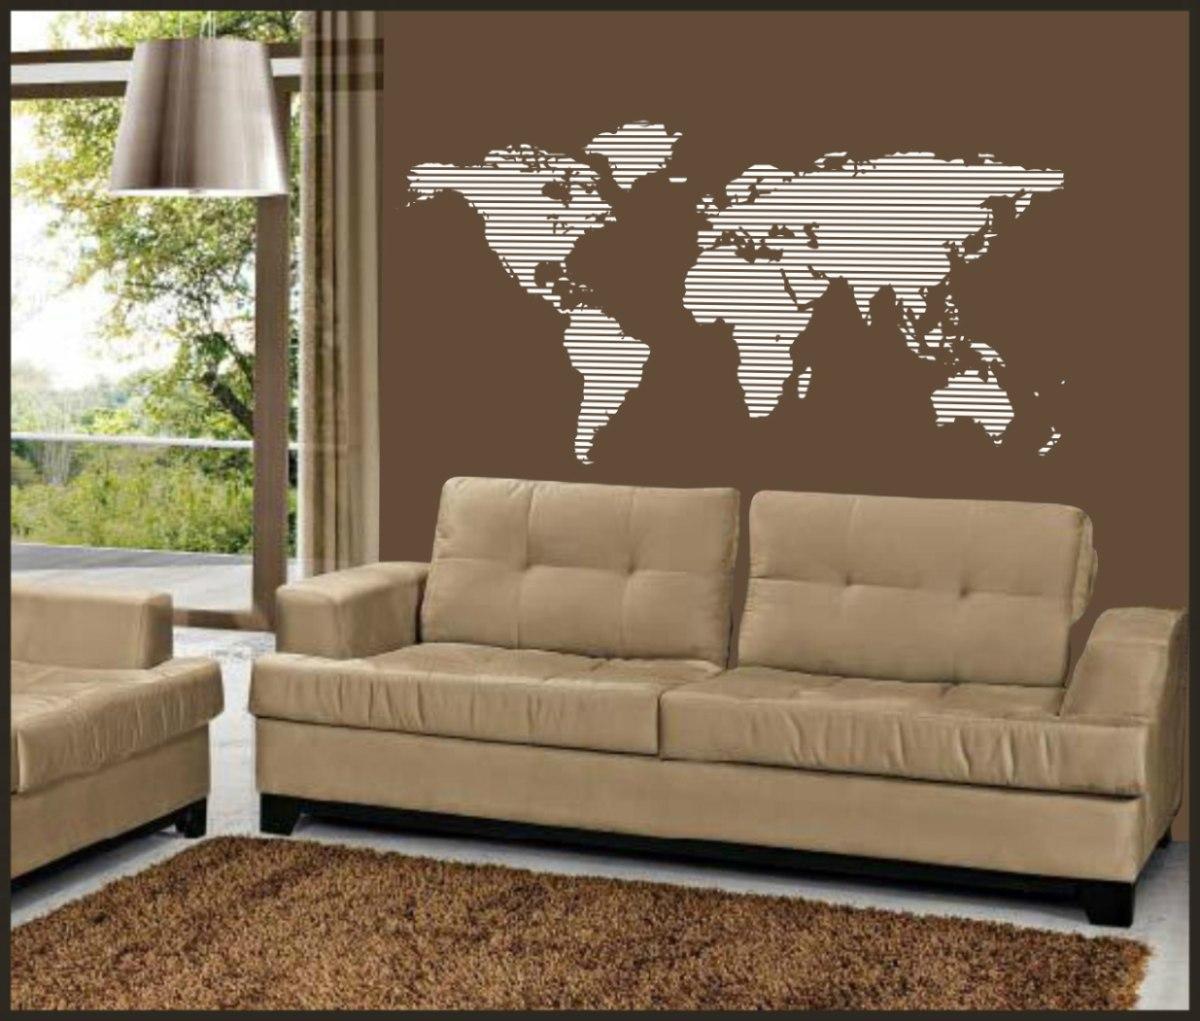 Adesivo De Parede Mapa Mundi Mercado Livre ~ Adesivo Decorativo Para Paredes, Mapa Mundi Listrado Tam